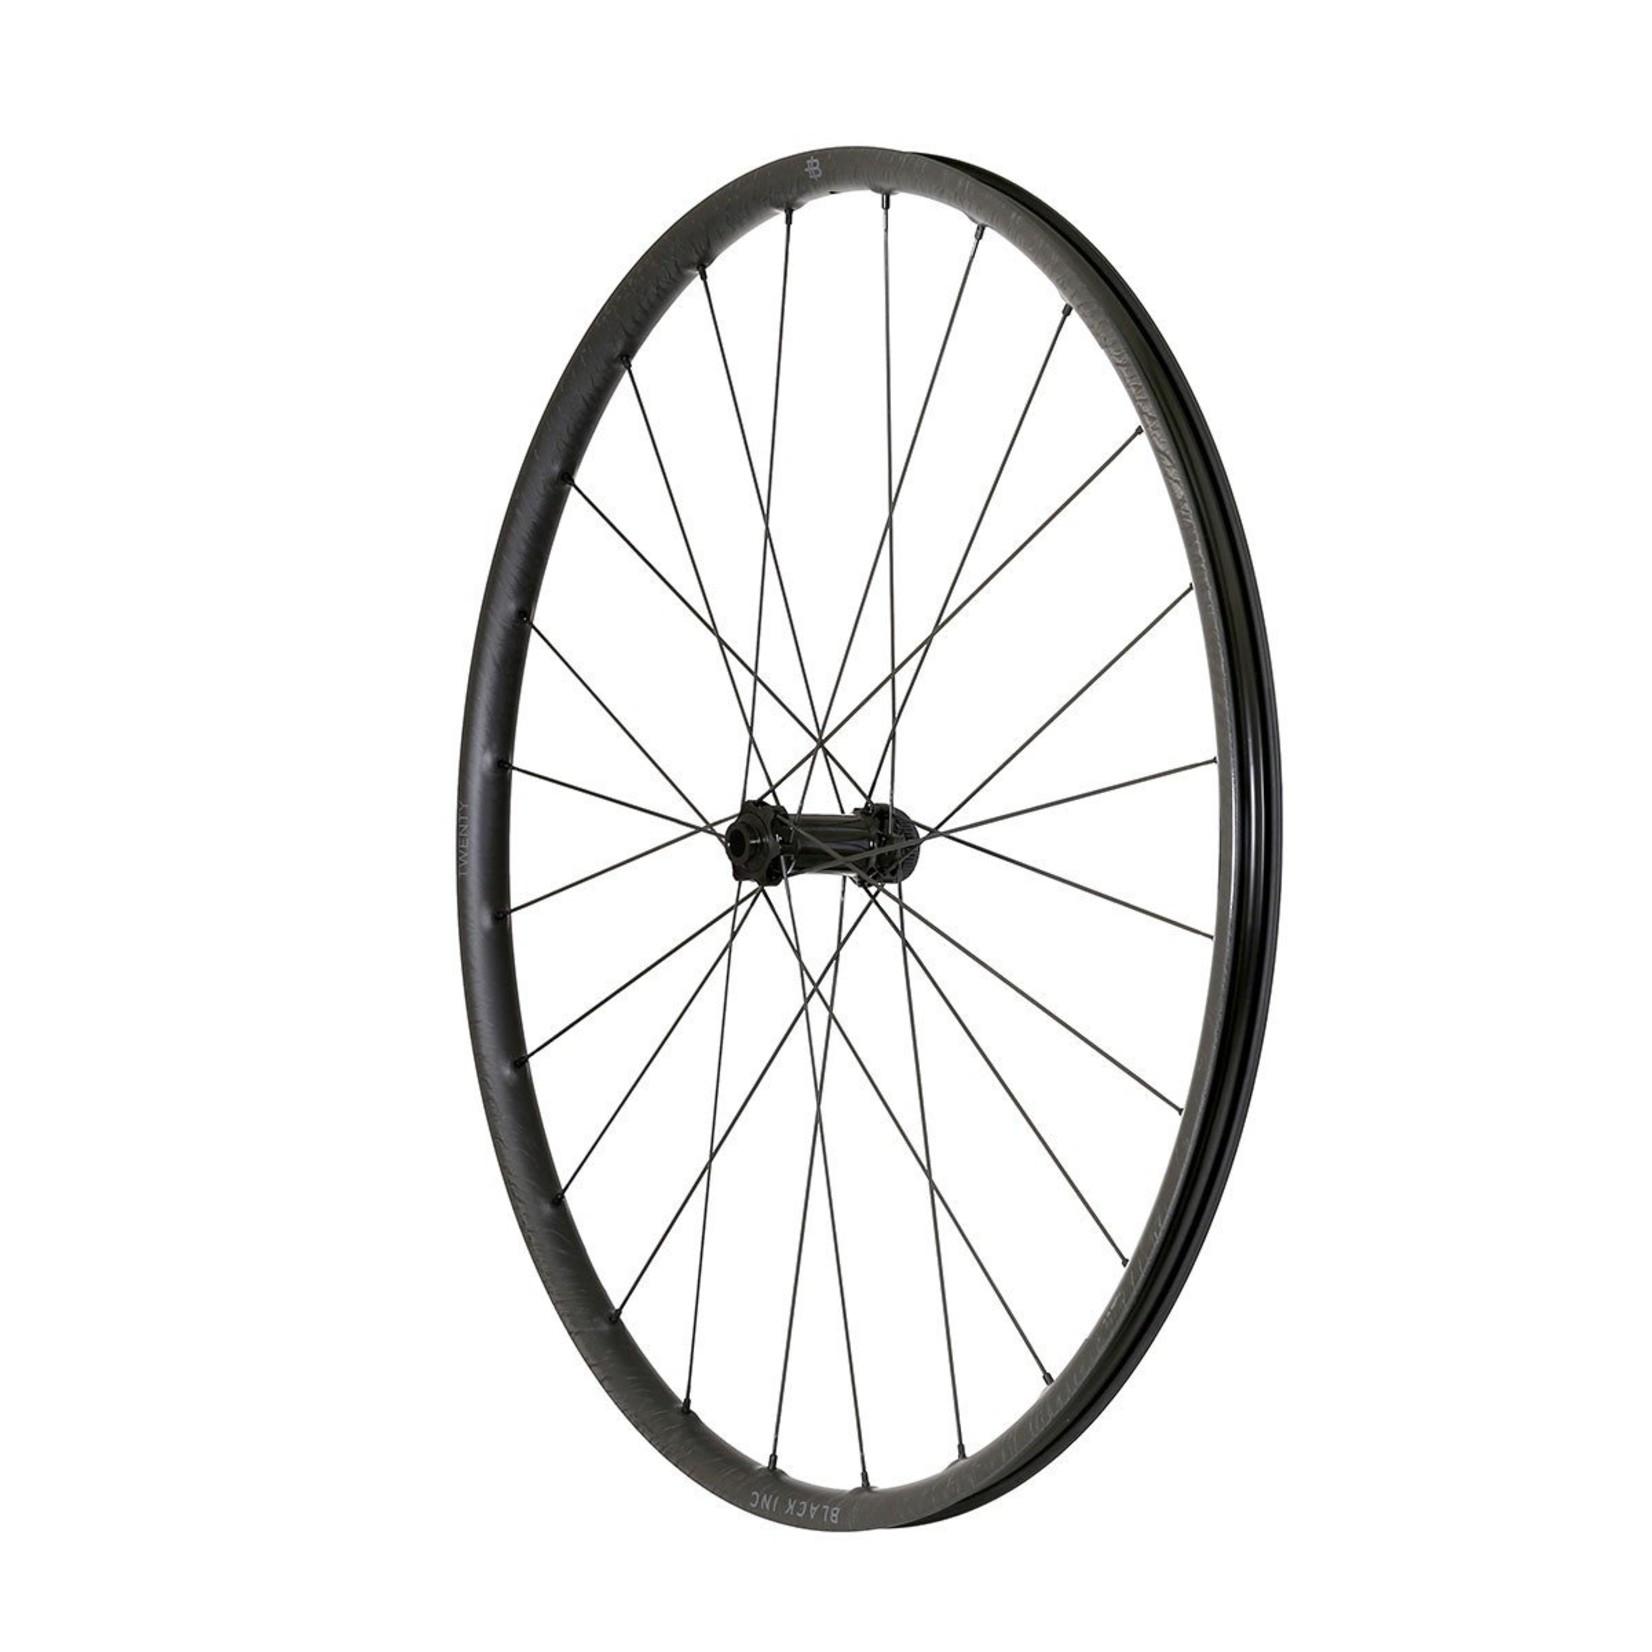 Black Inc Black Inc TWENTY Wheelset - Disc Brakes - Clincher